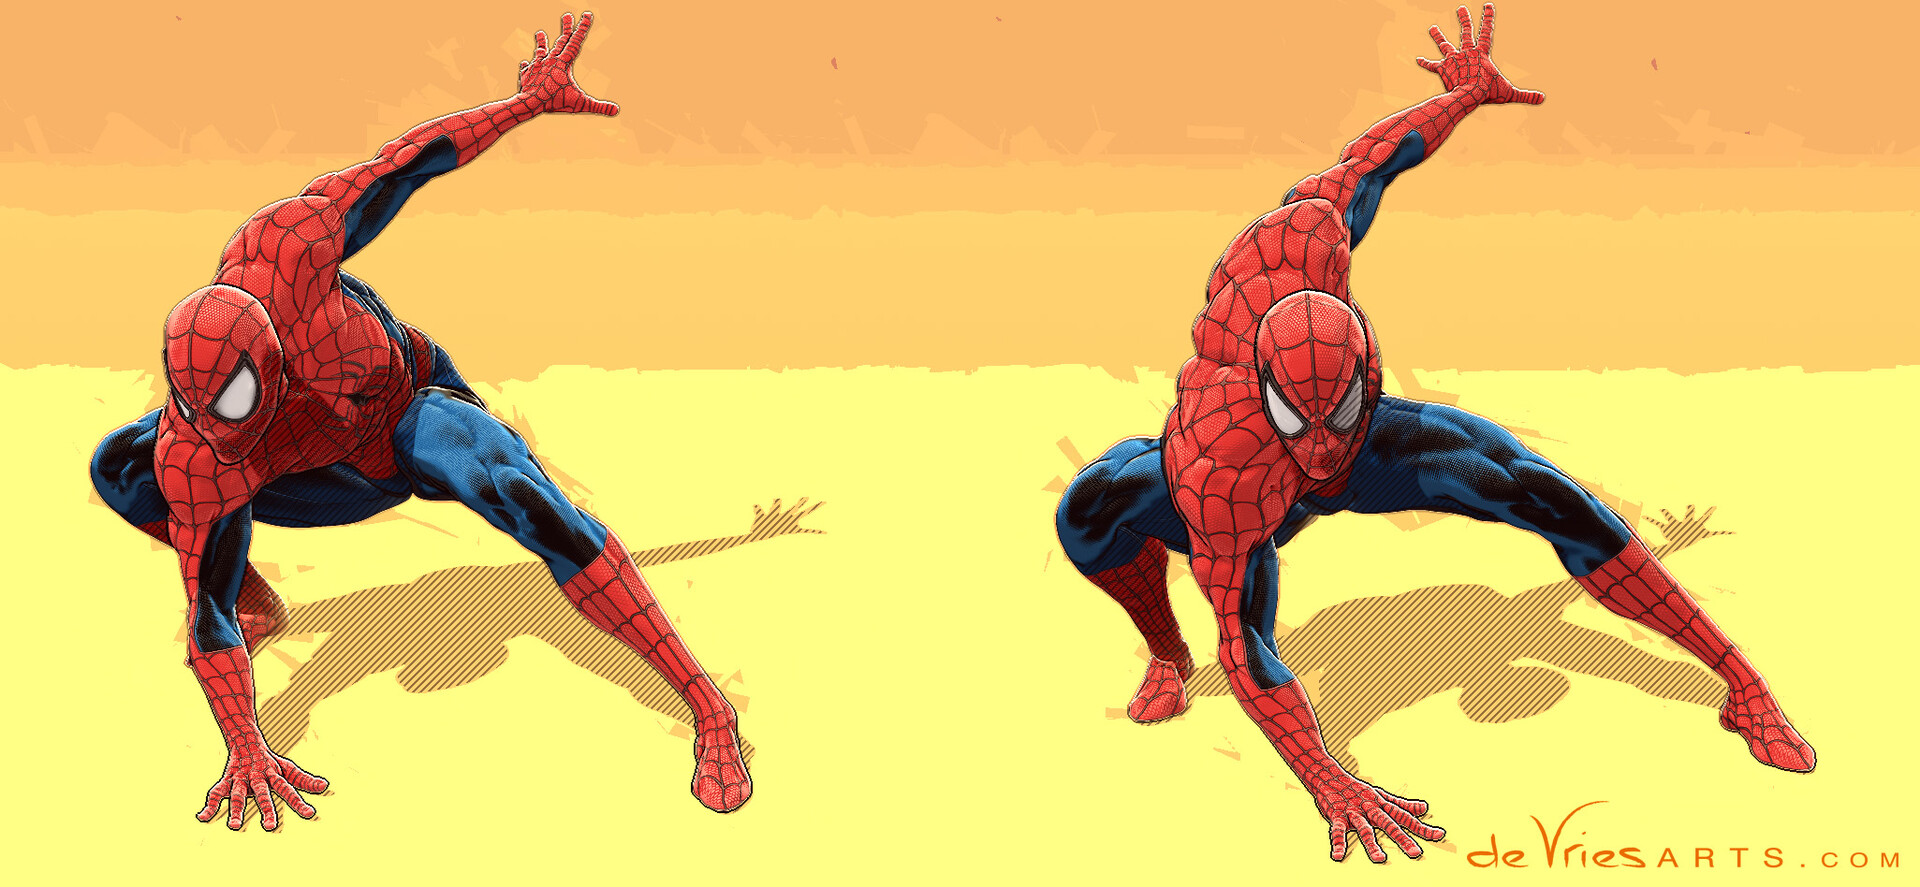 Thijs de vries crouch2 spiderman thijsdevries devriesarts